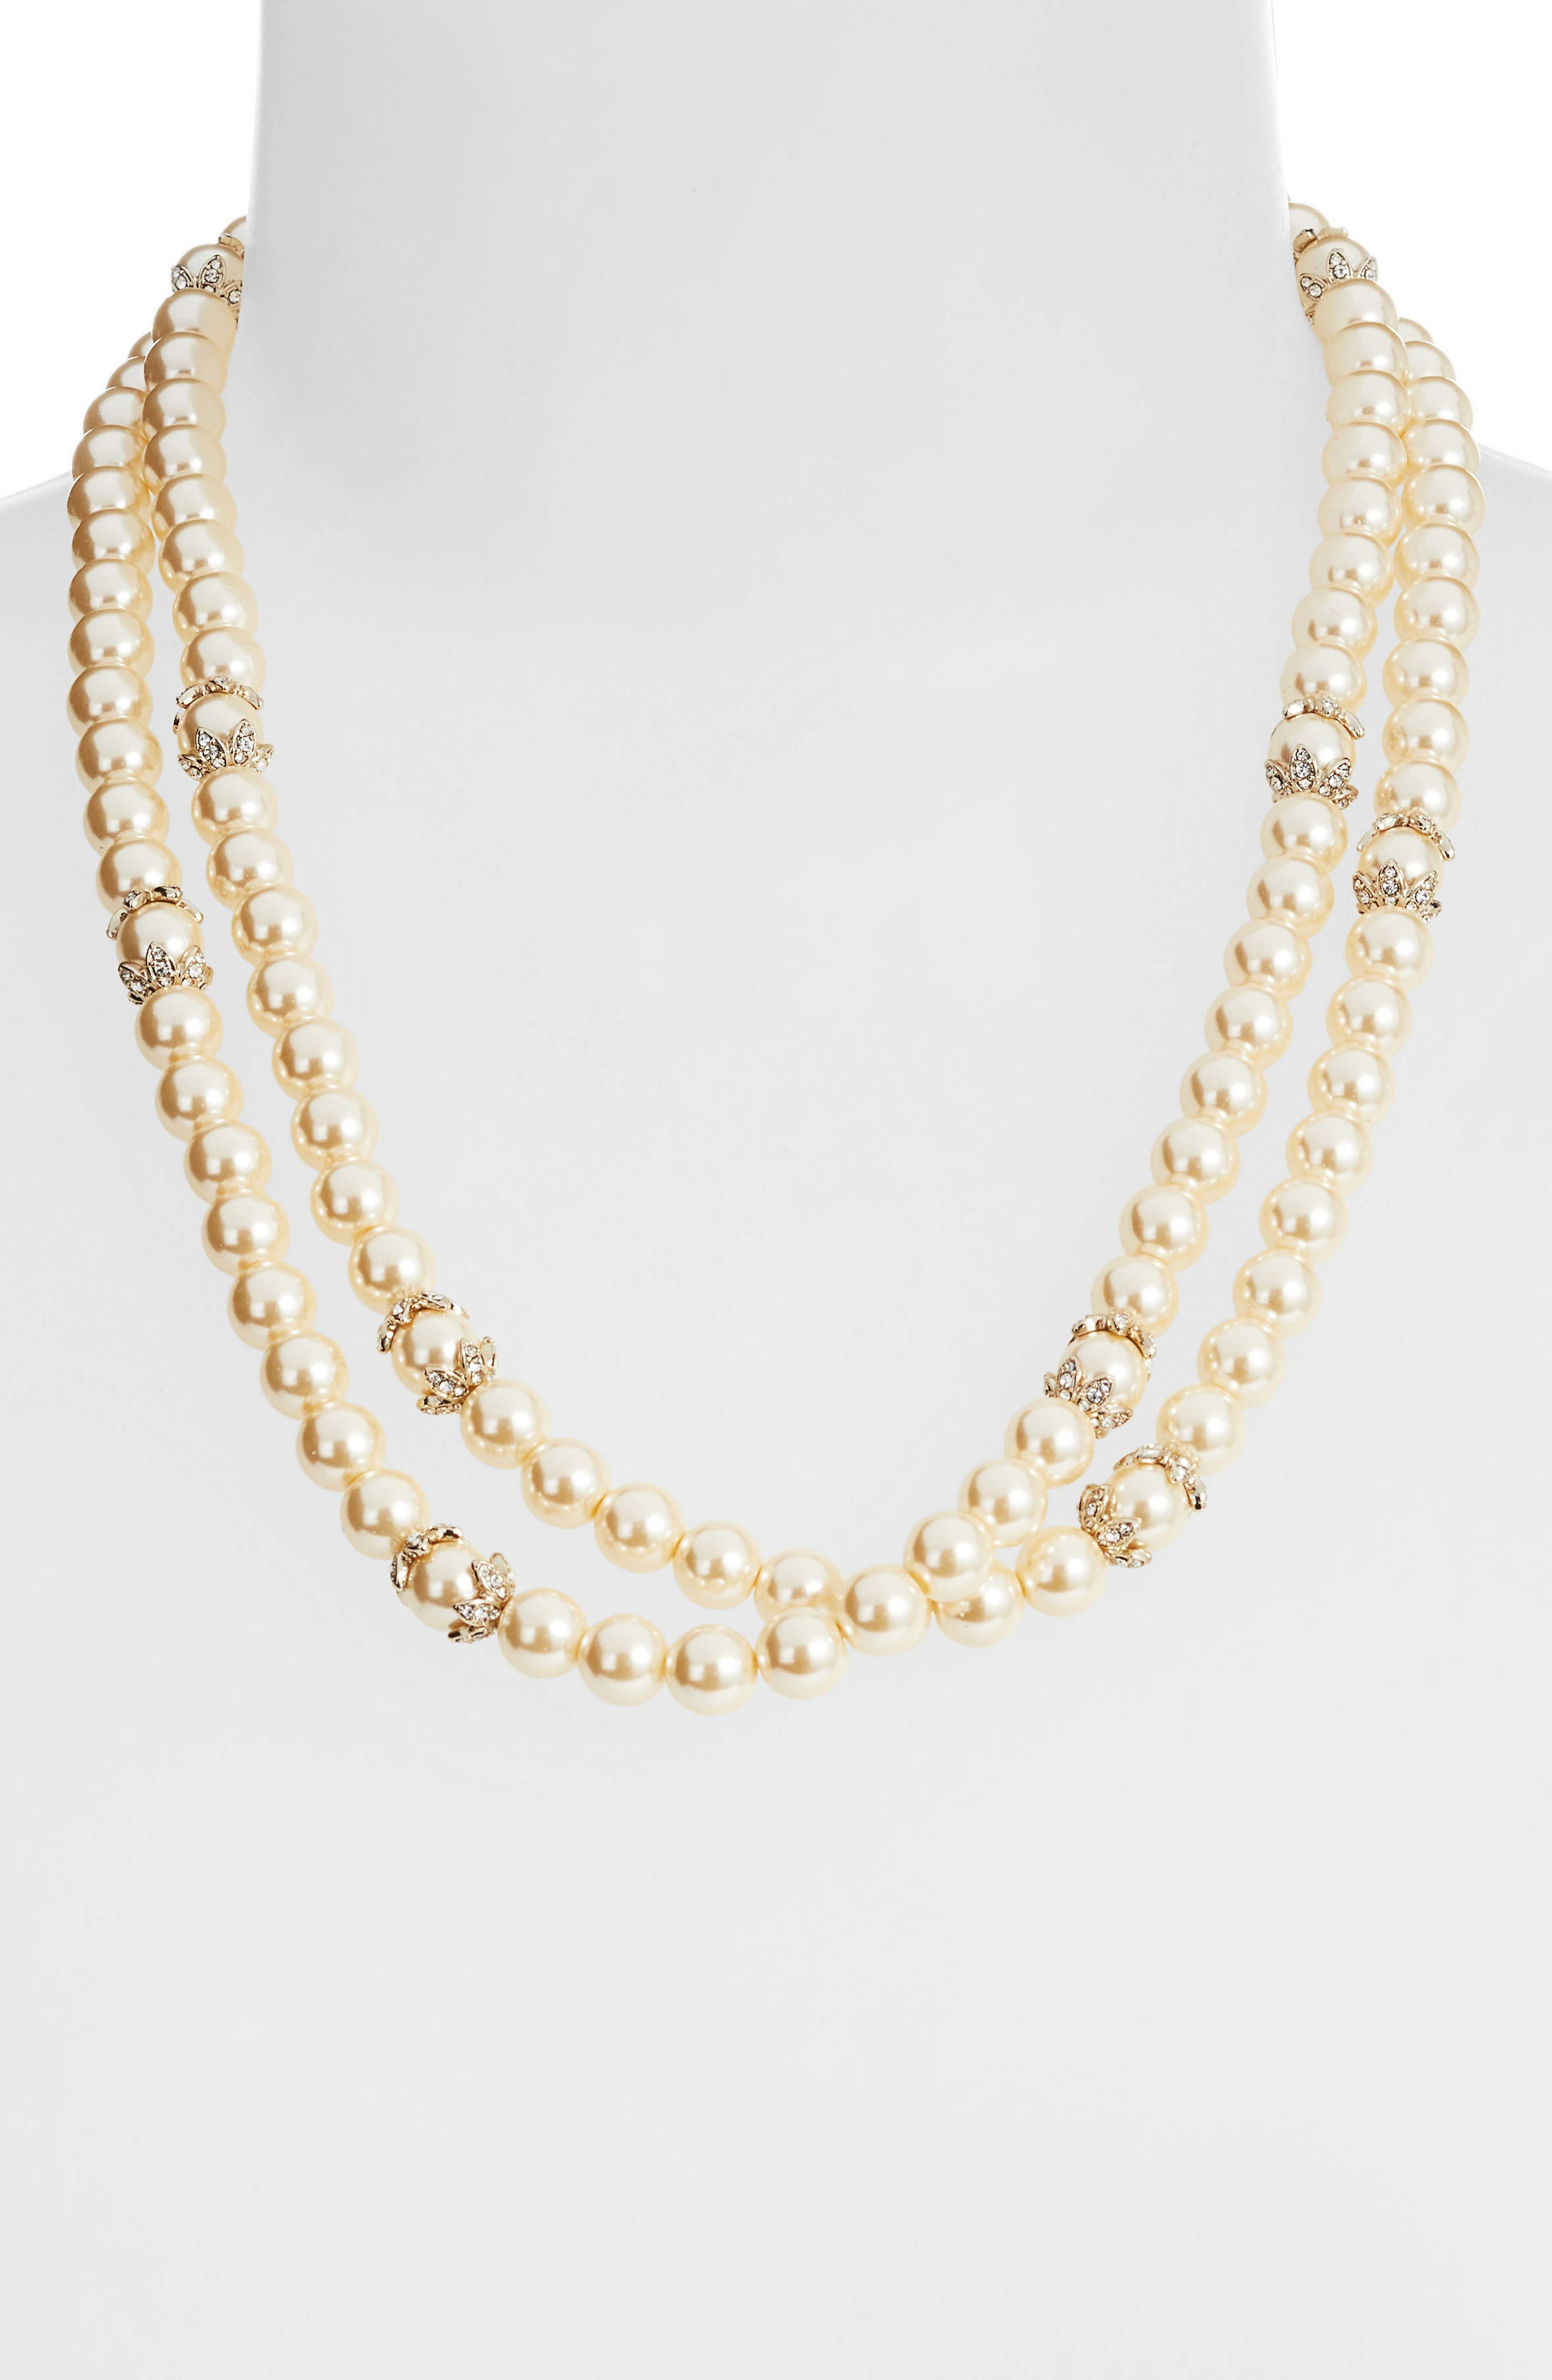 MARCHESA, Long Imitation Pearl Strand Necklace, Alternate thumbnail 2, color, BLUSH/ GOLD